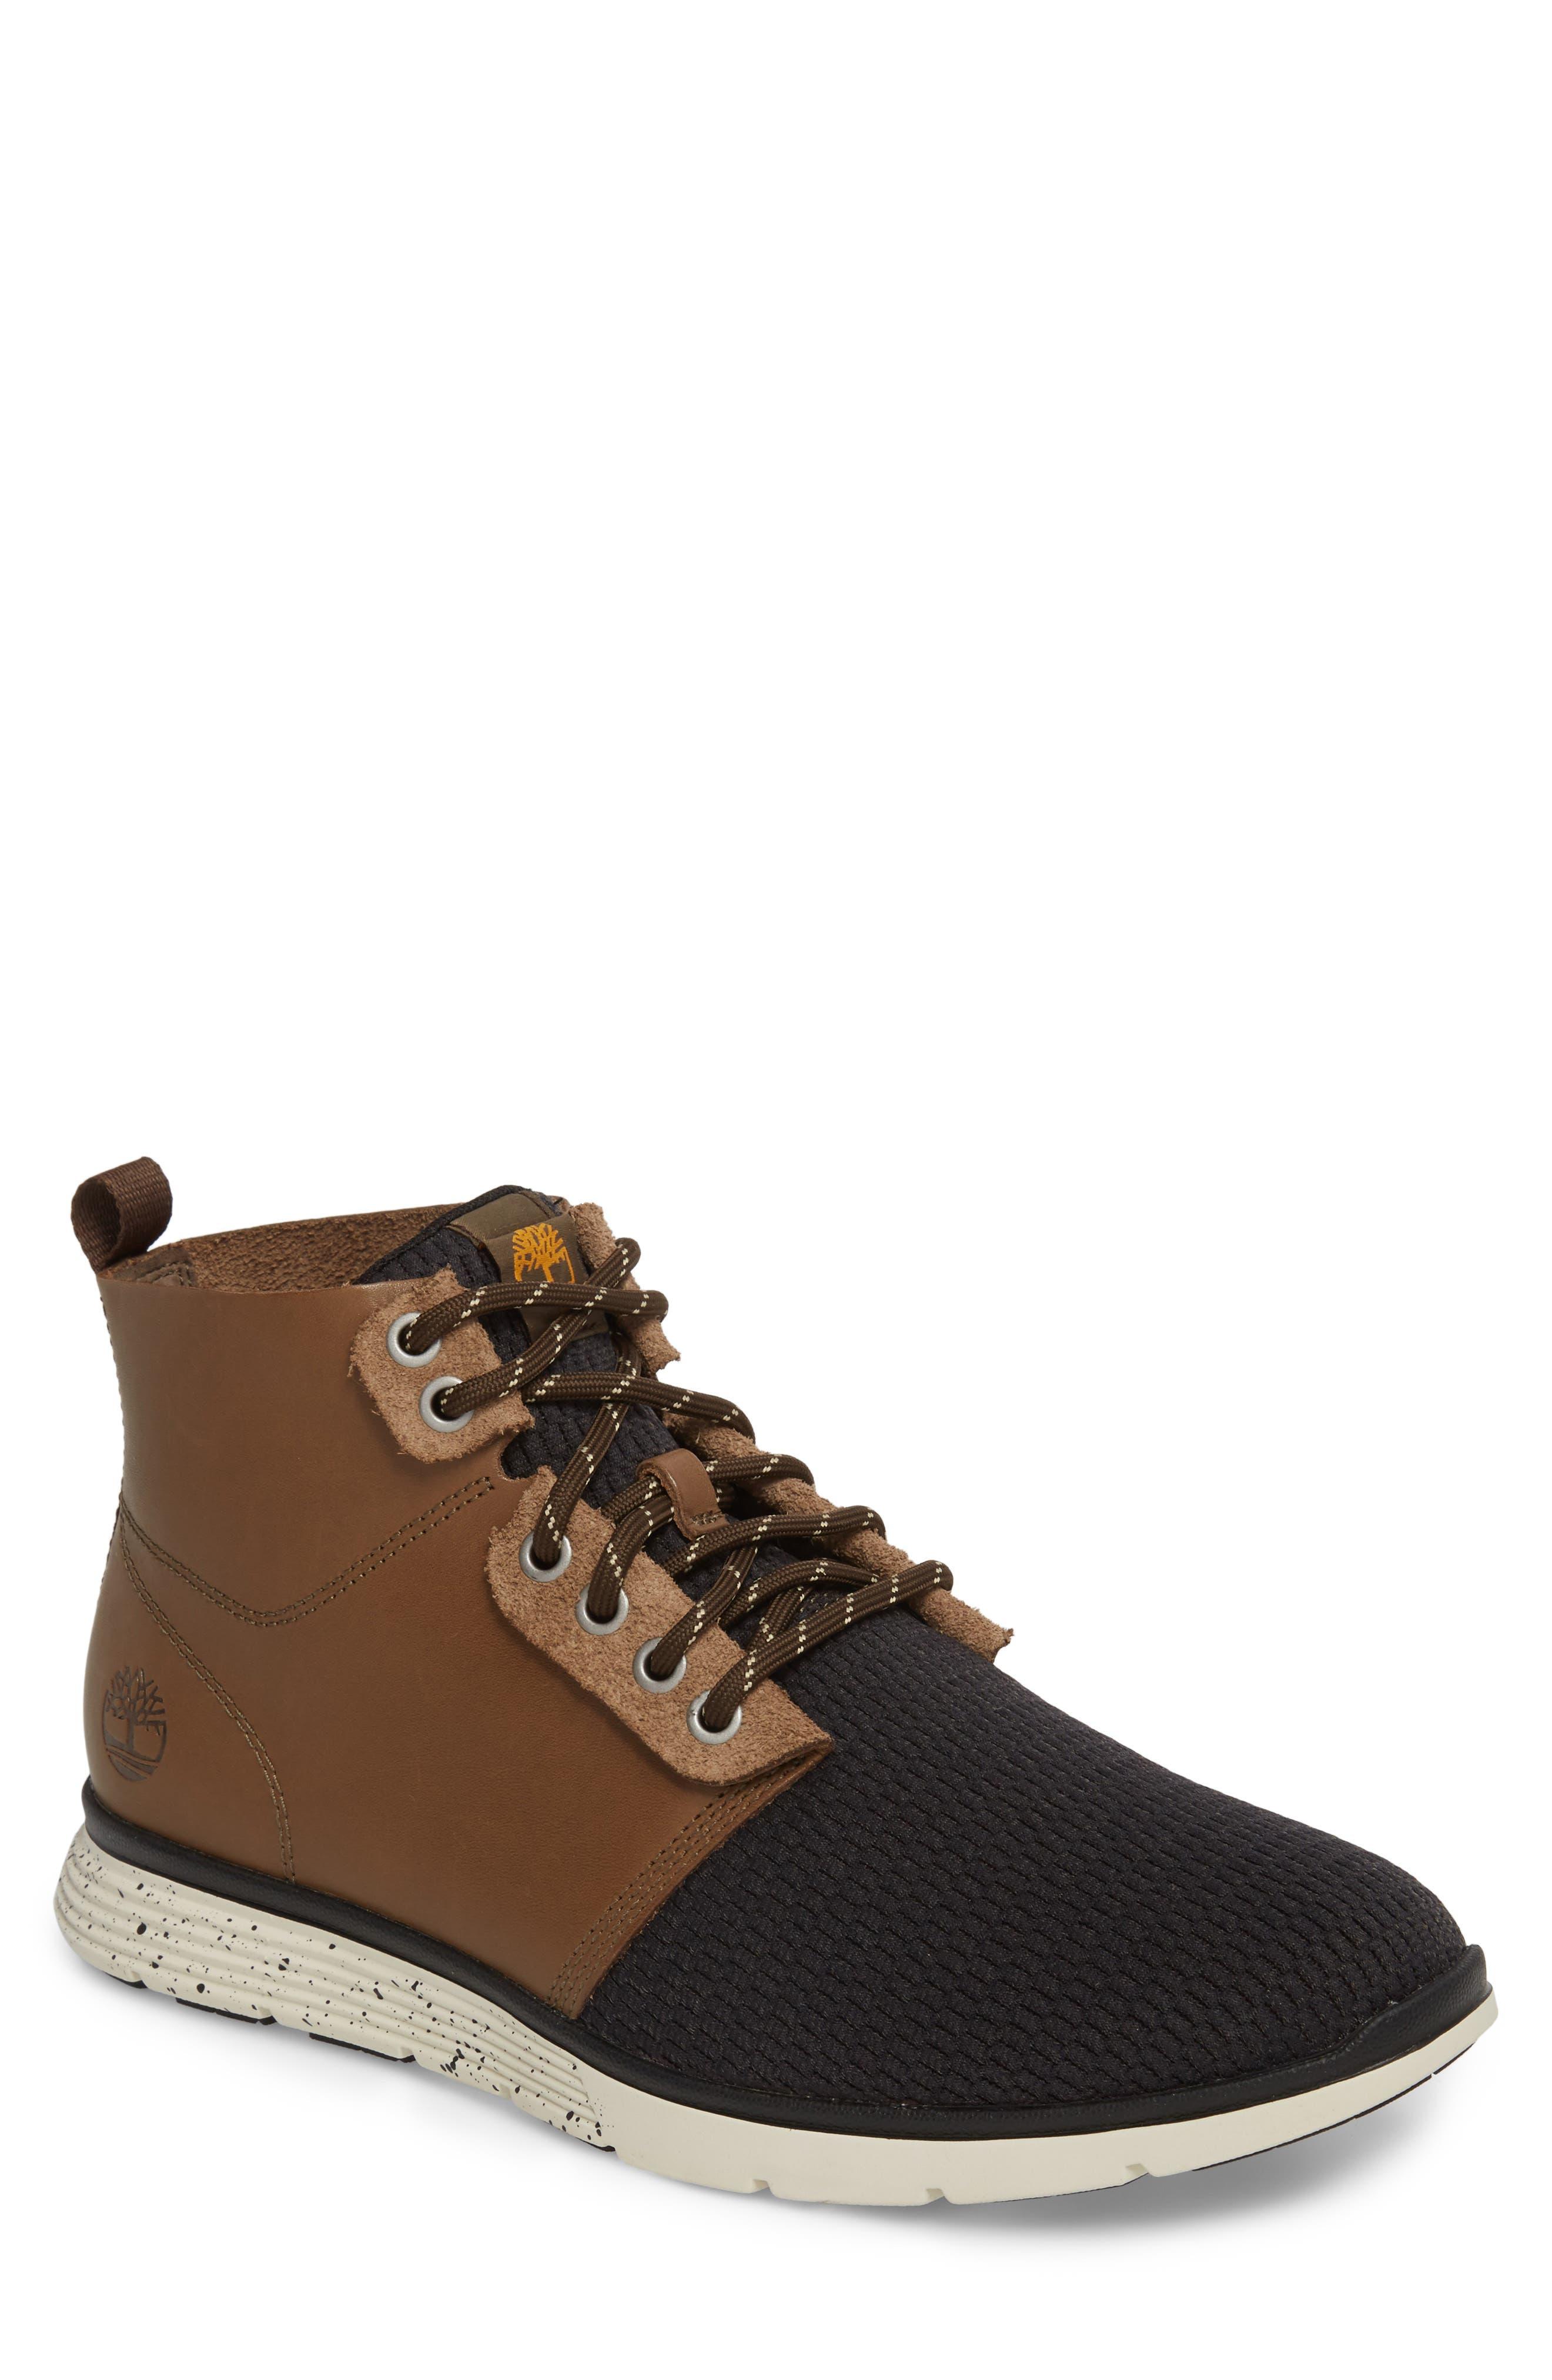 Killington Plain Toe Boot,                         Main,                         color, Buckskin Leather